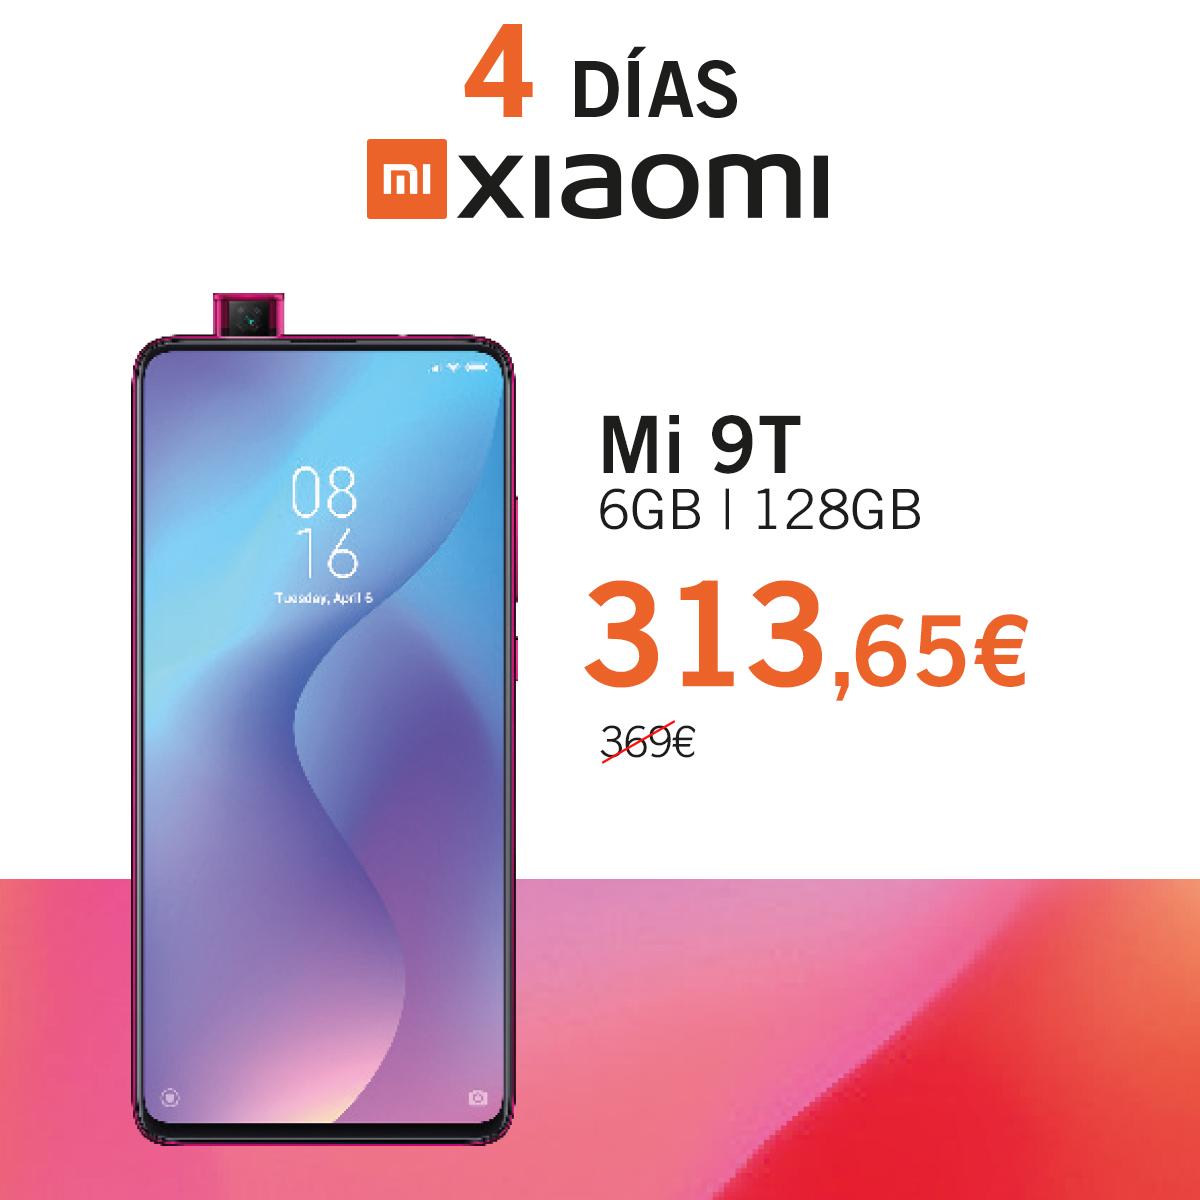 Mi 9t Dias Xiaomi